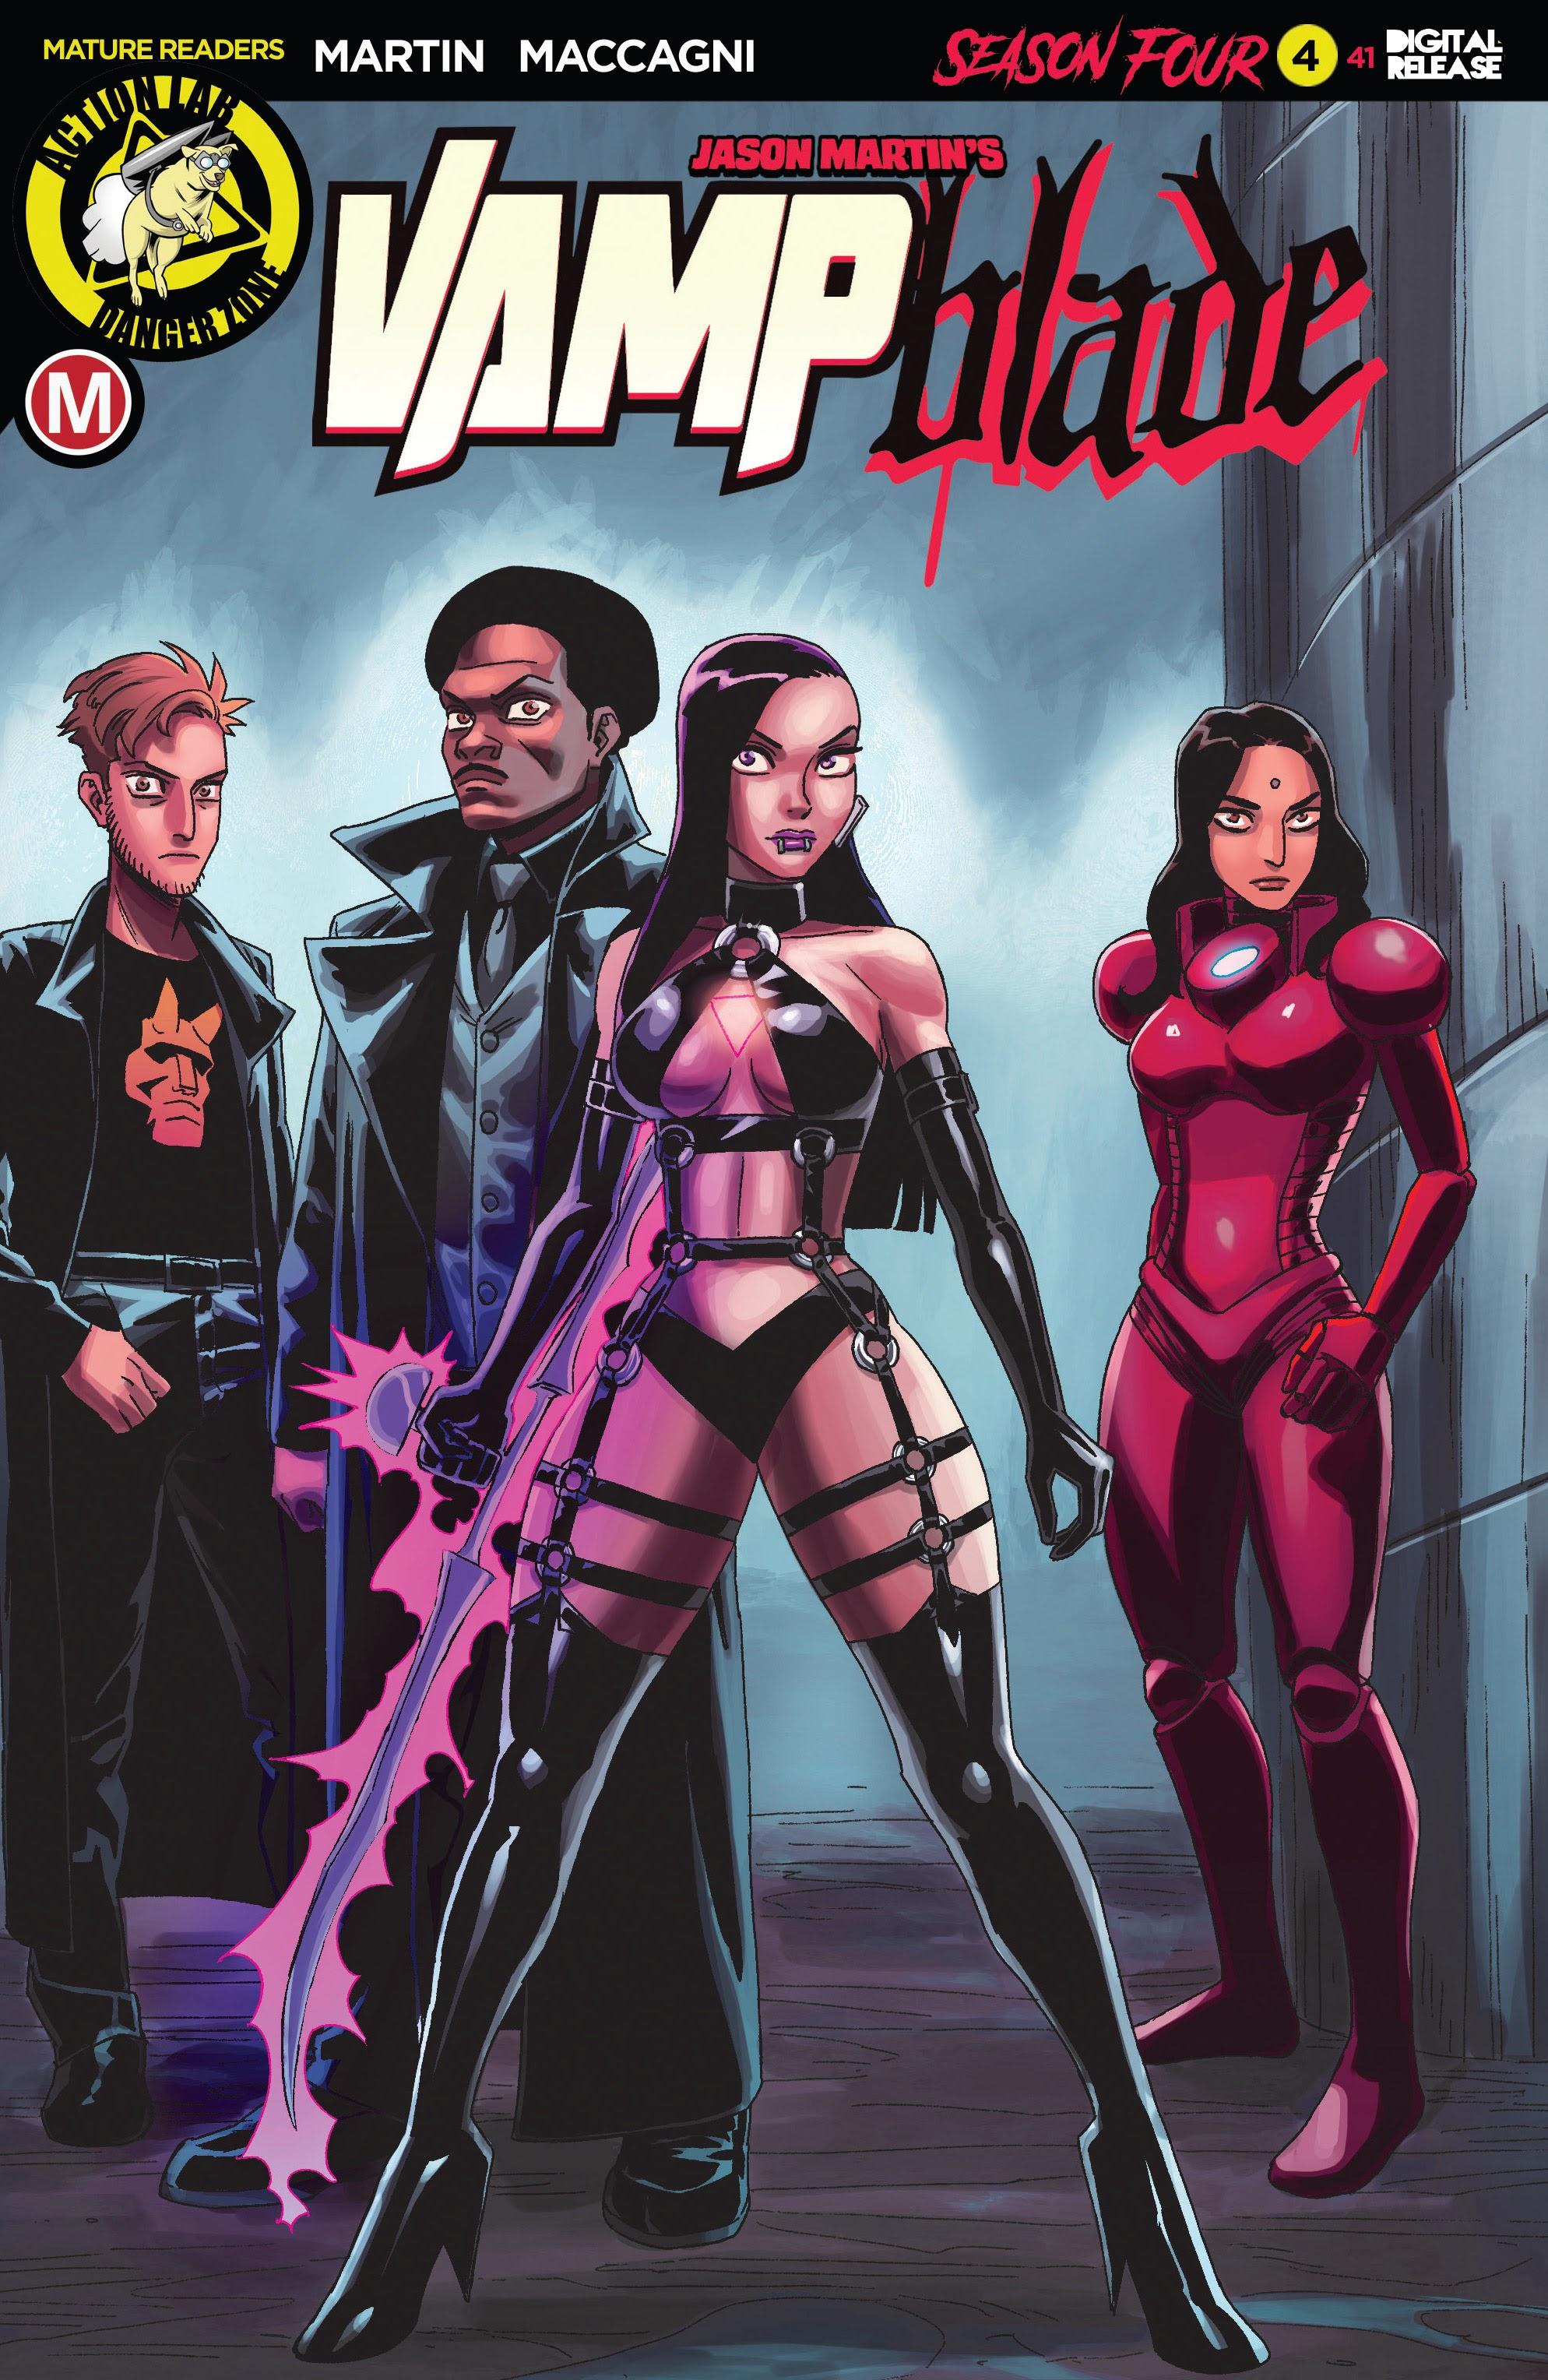 Vampblade Season 4 4 Page 1